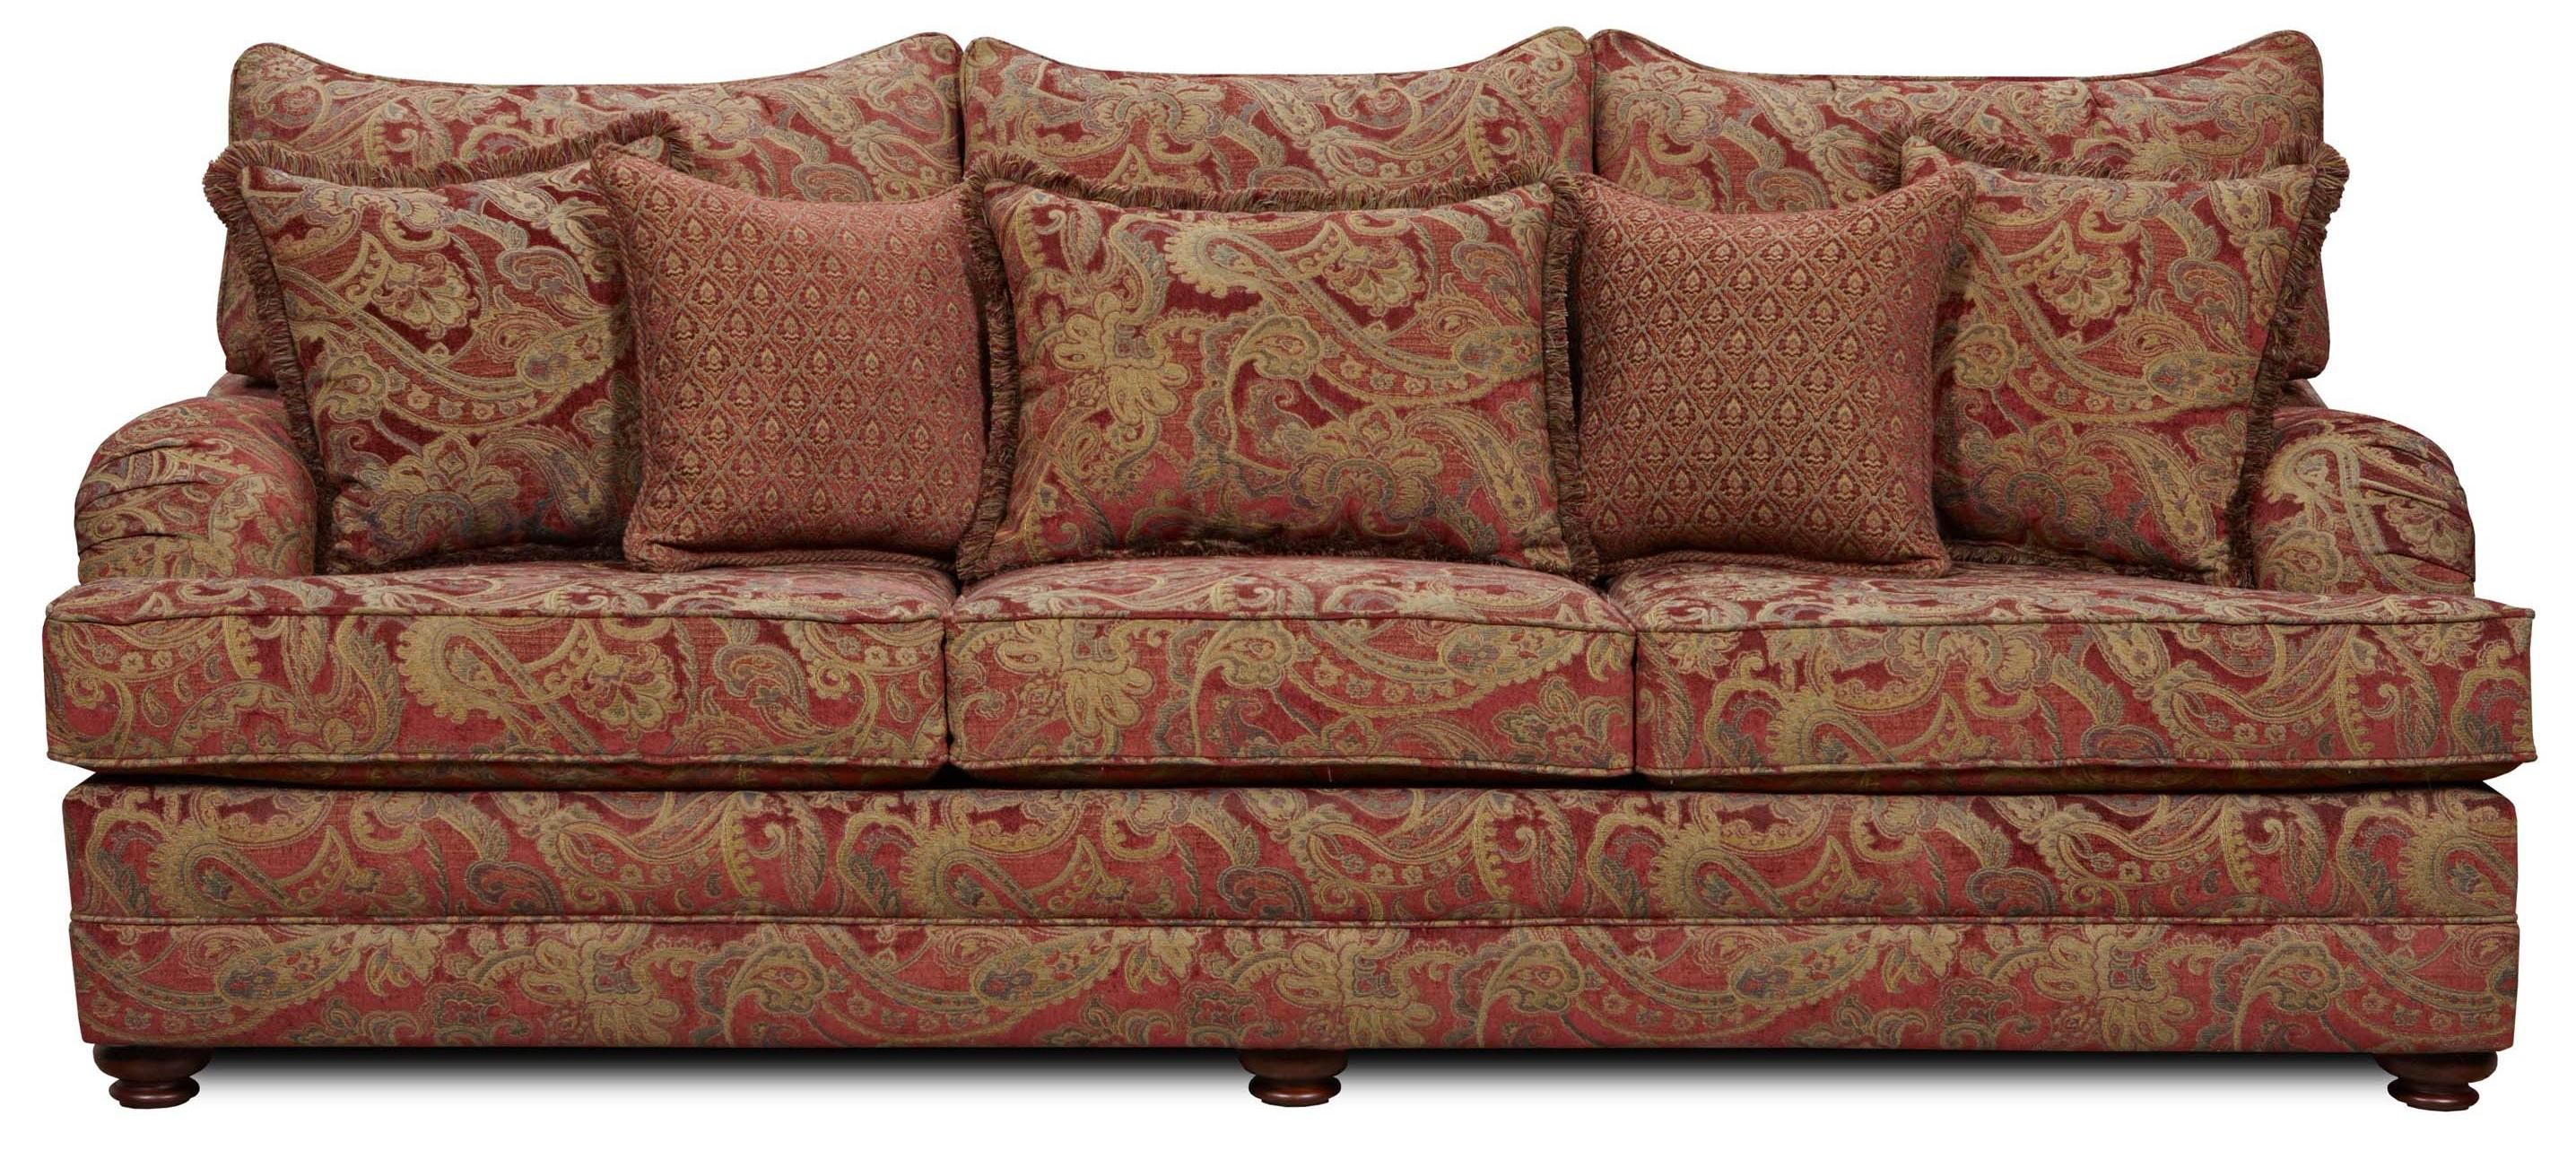 Traditional Sofa Throw Pillows : Washington 1130 Traditional Sofa with Throw Pillows Bennett s Home Furnishings Sofa